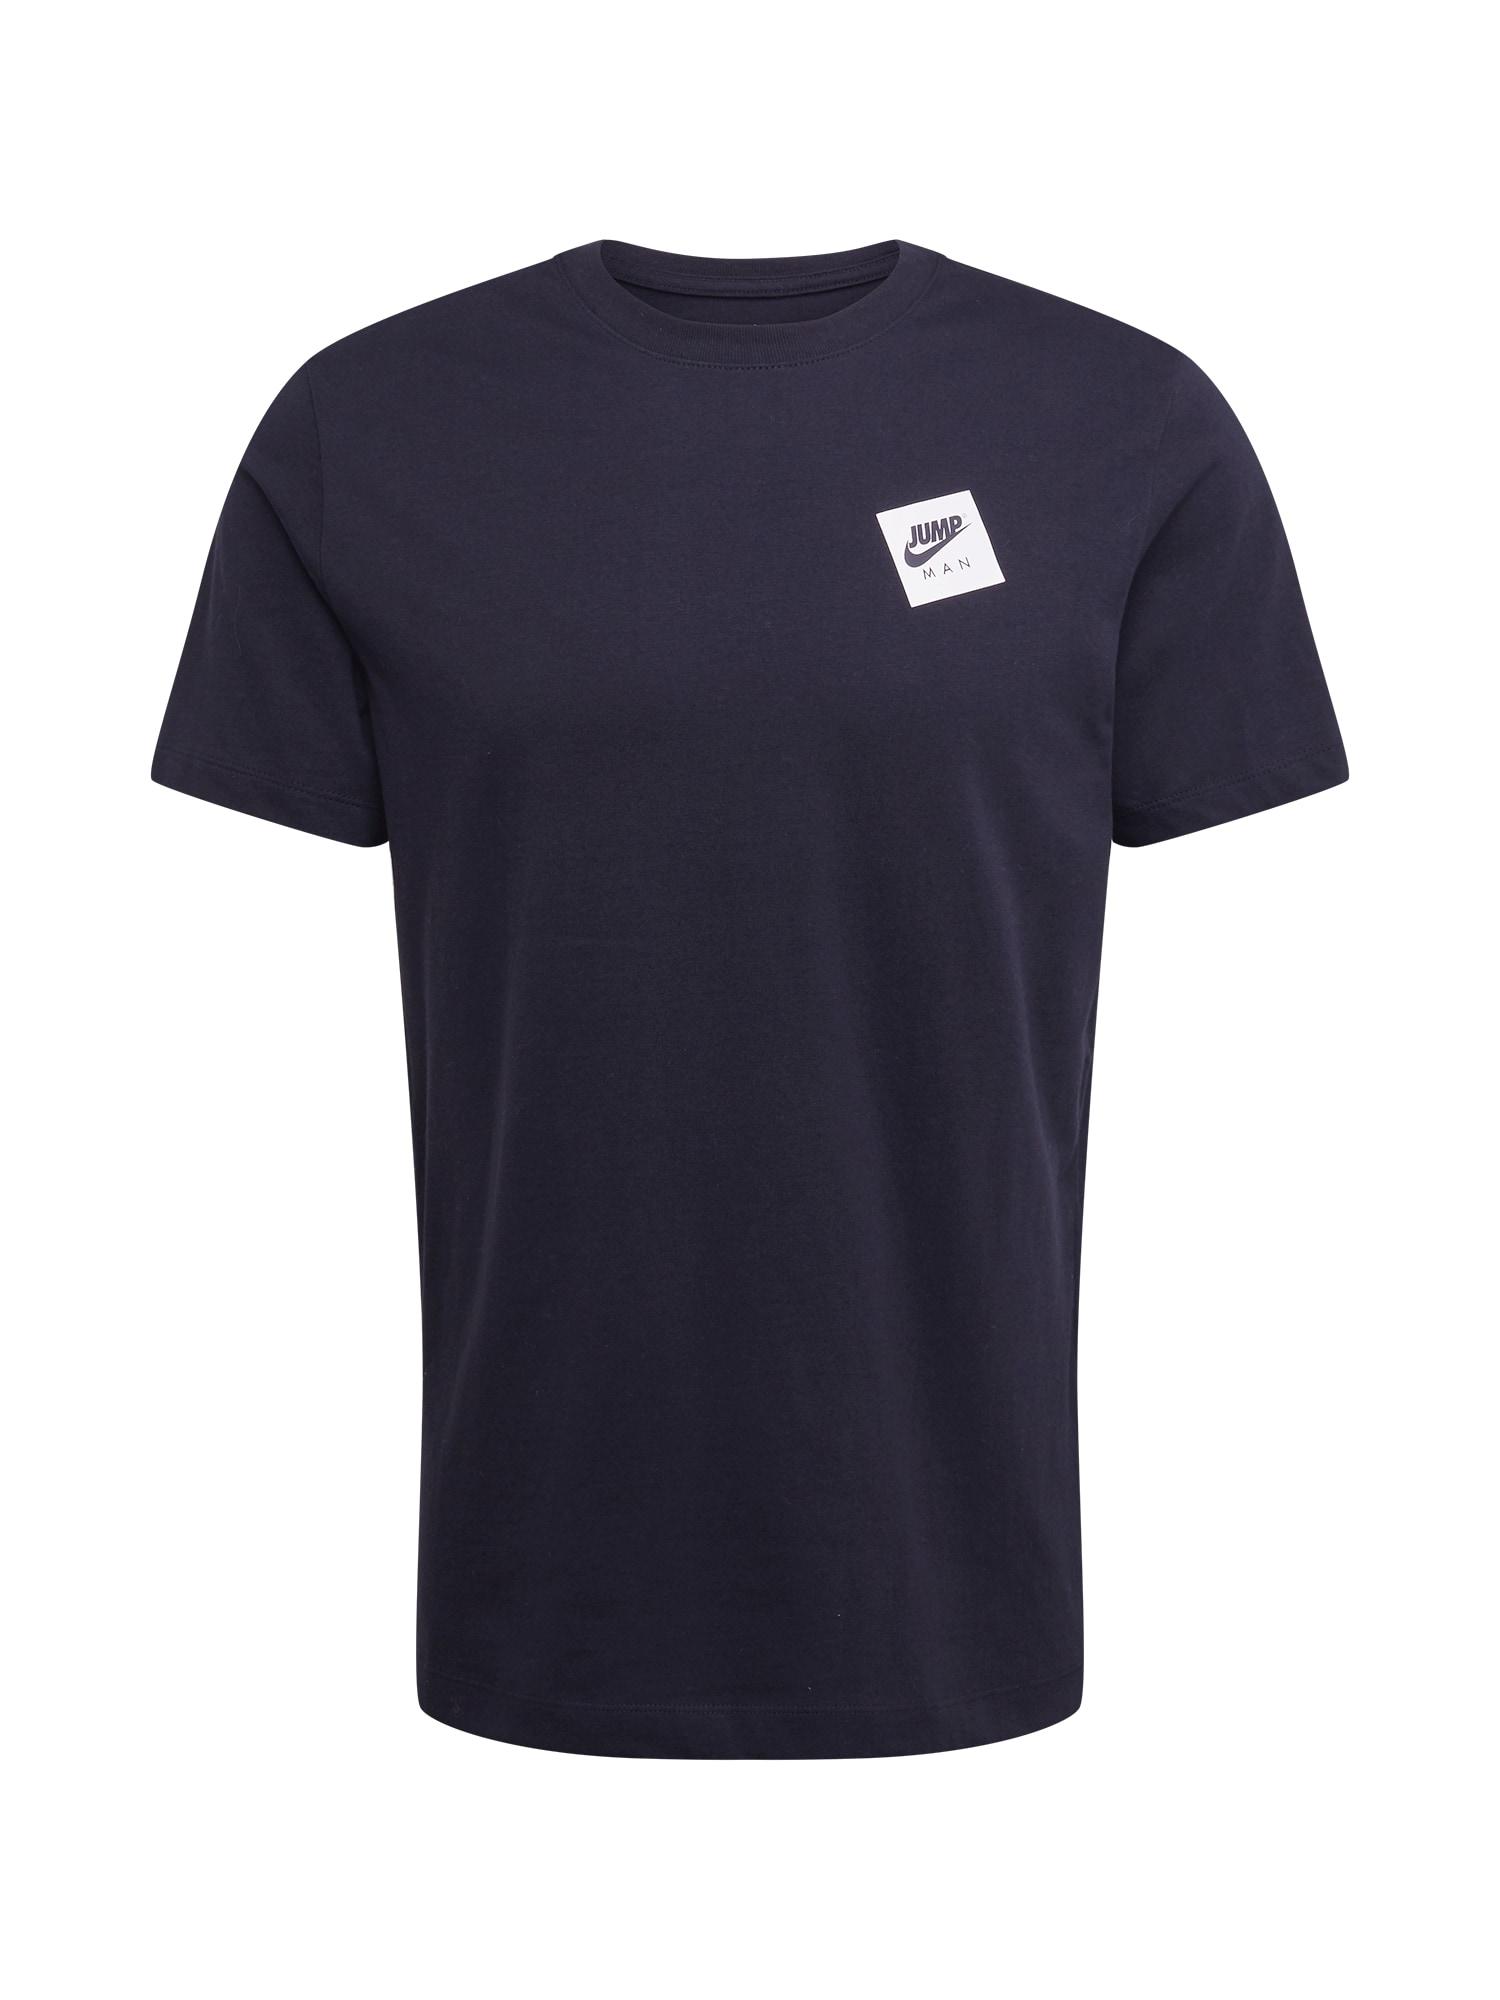 Jordan Marškinėliai juoda / balta / melionų spalva / bazalto pilka